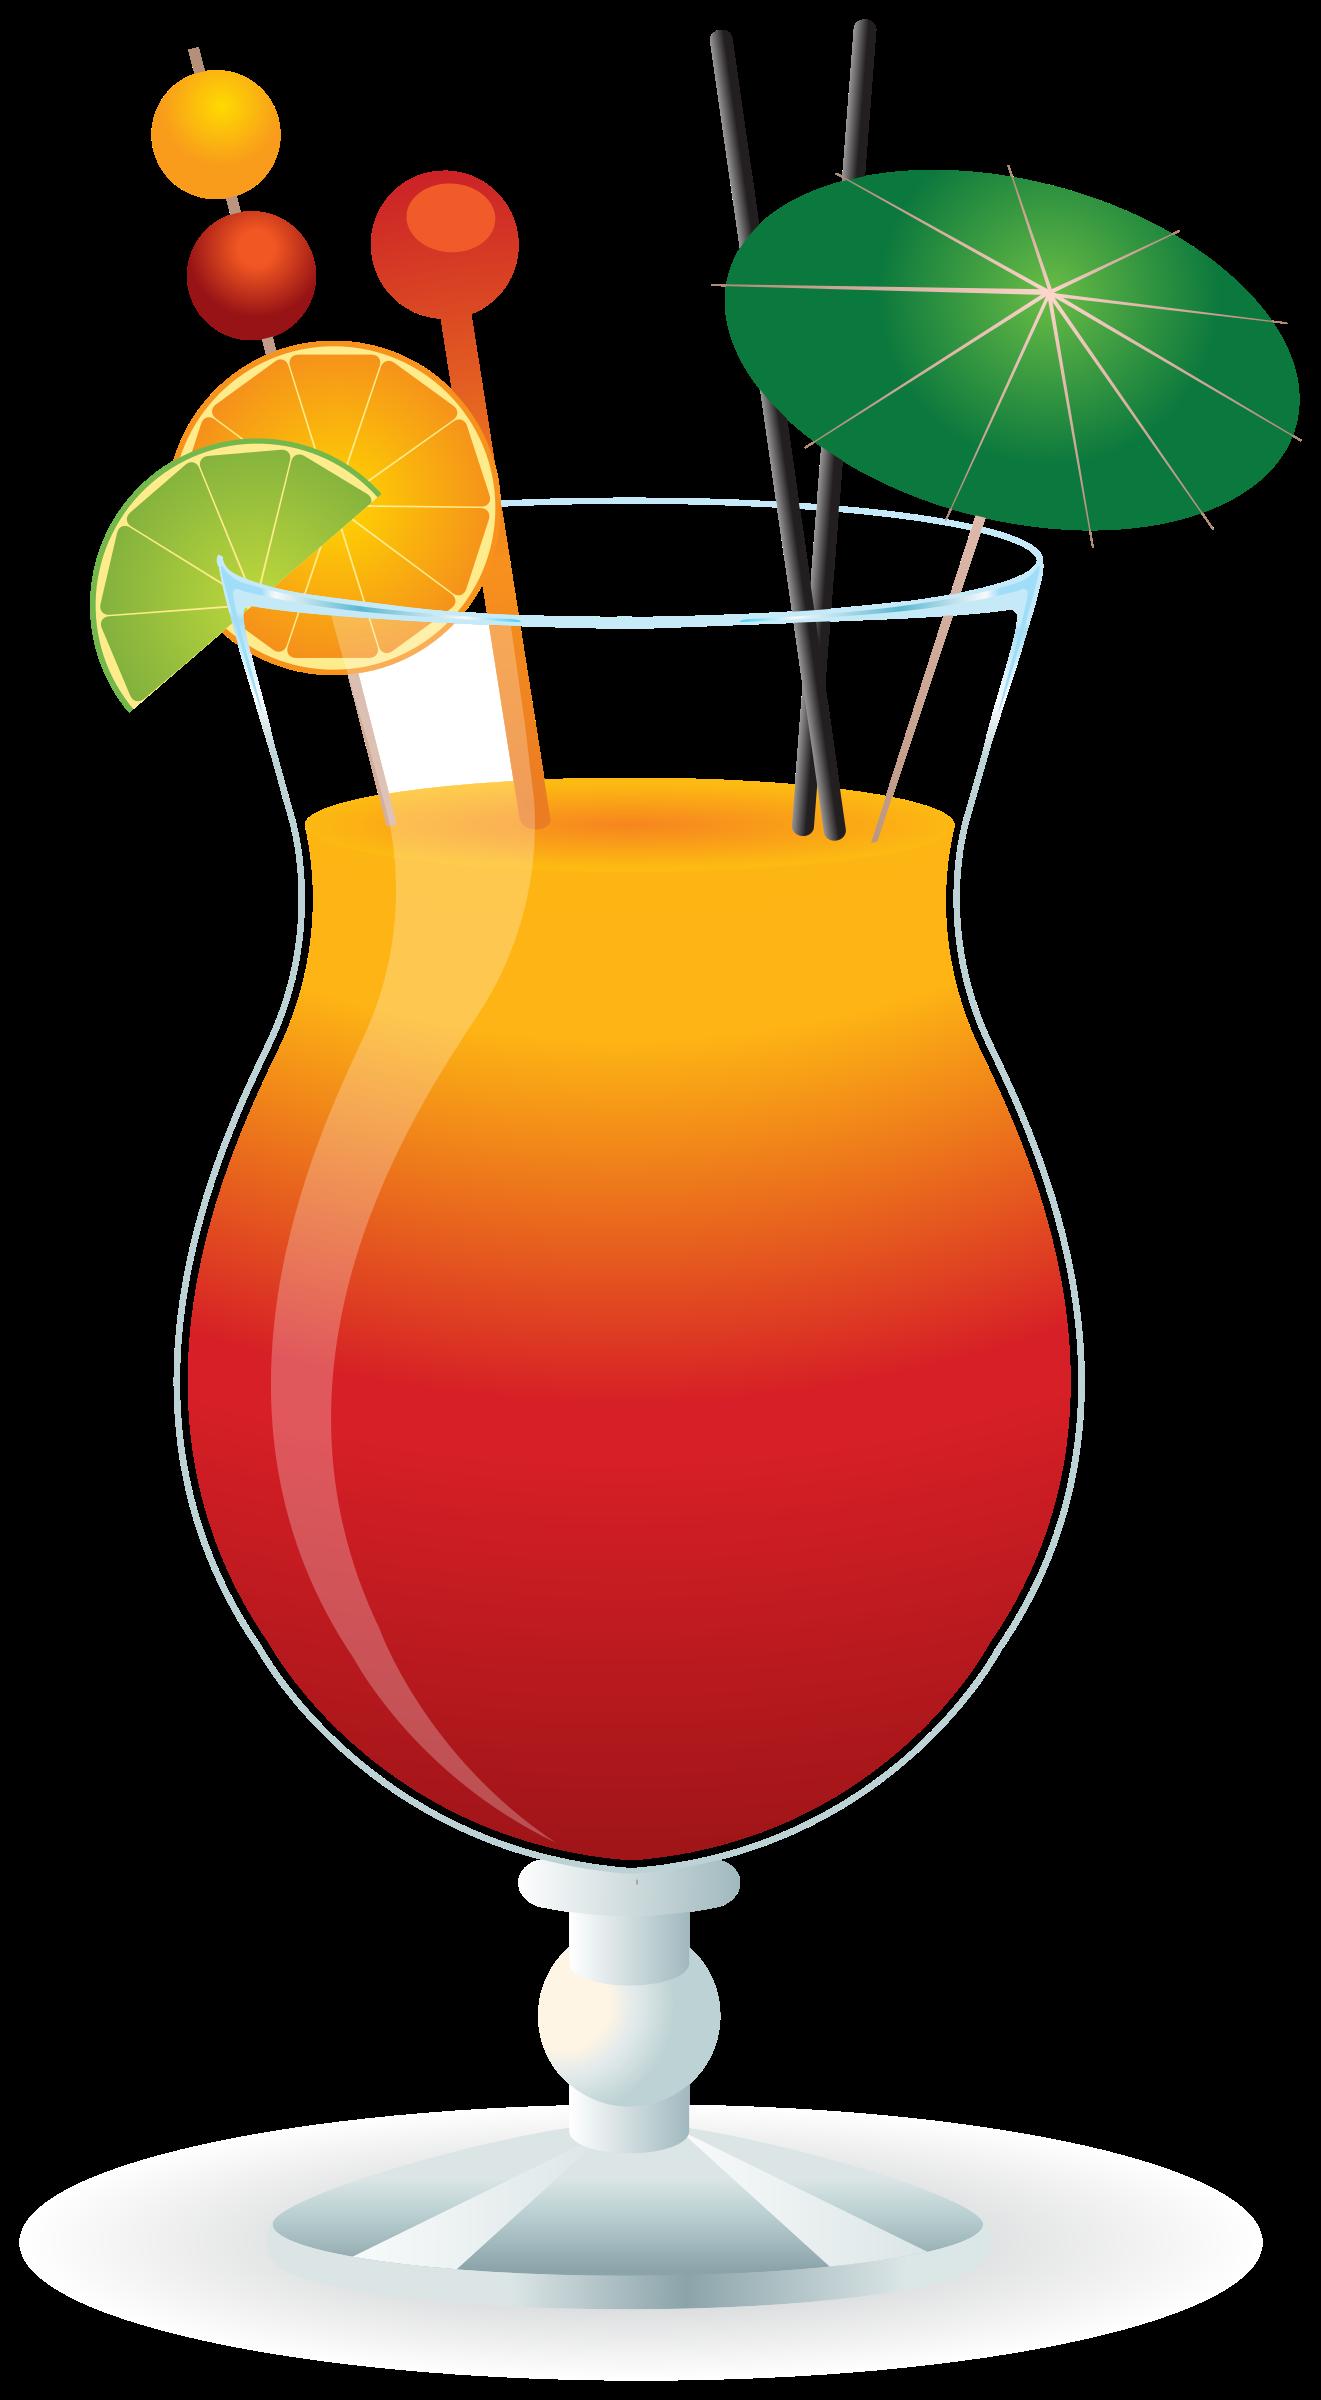 clip art Drink clipart. Cocktail glass big image